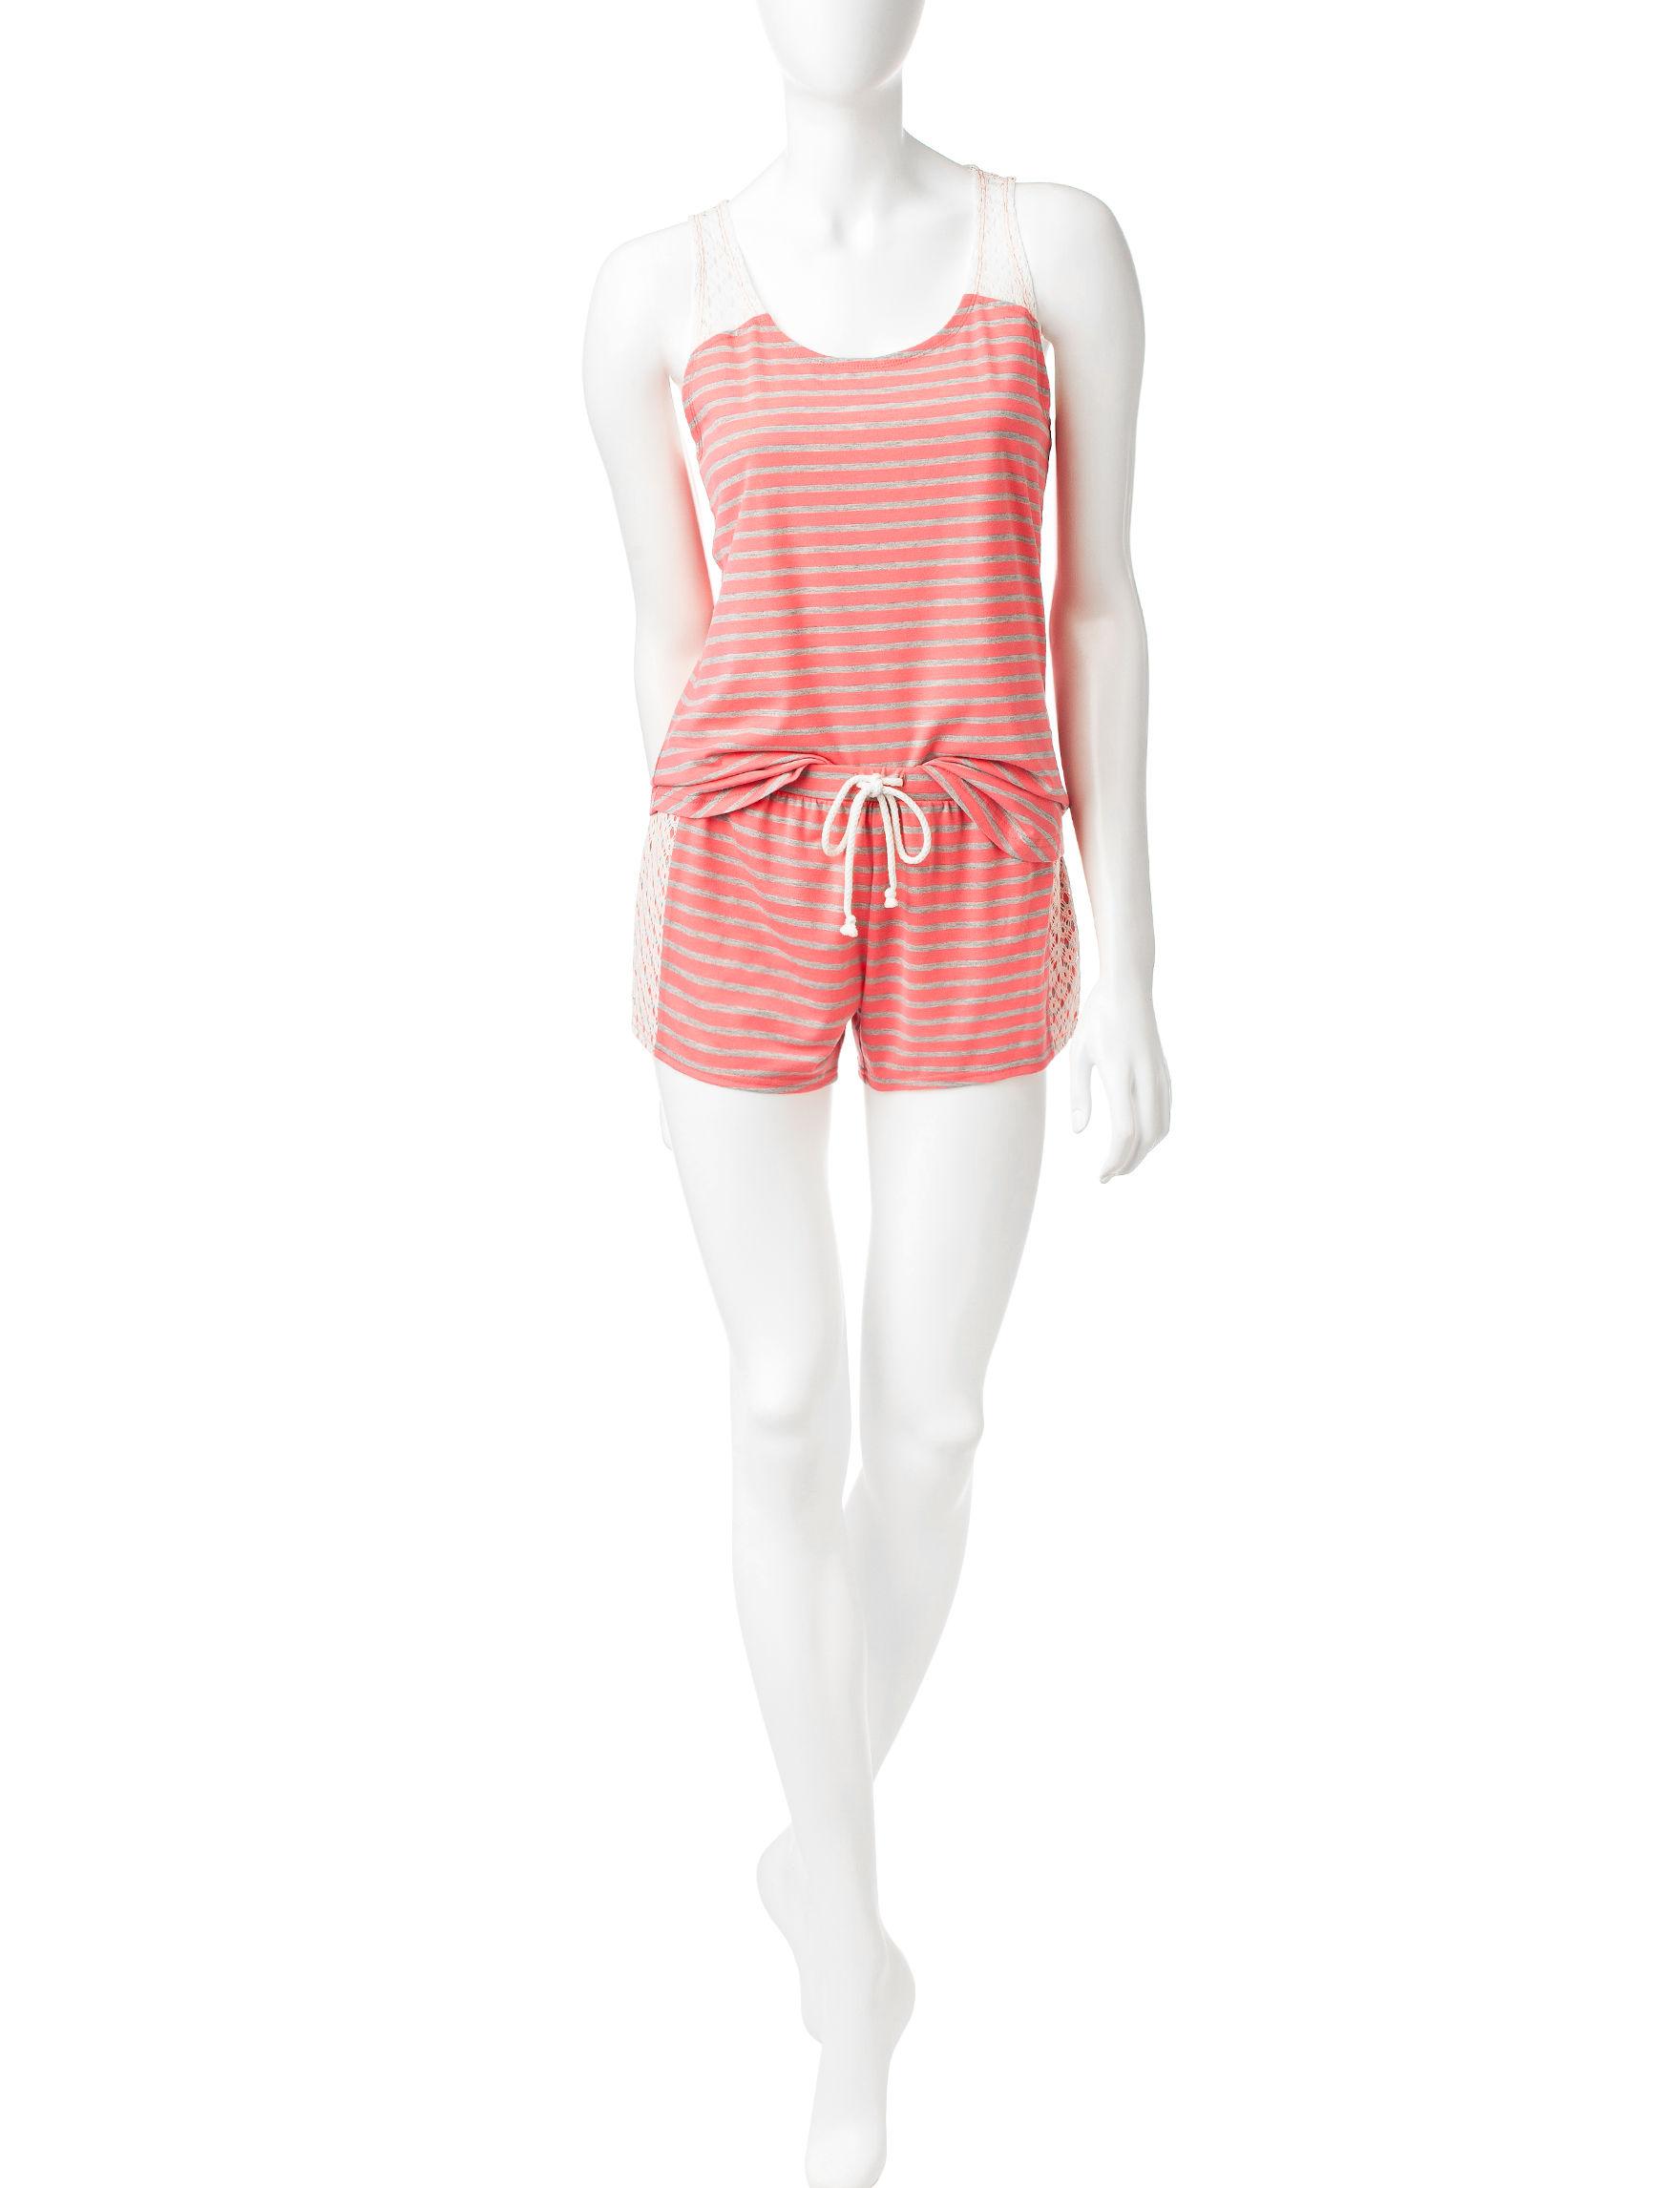 PJ Couture Orange Pajama Sets